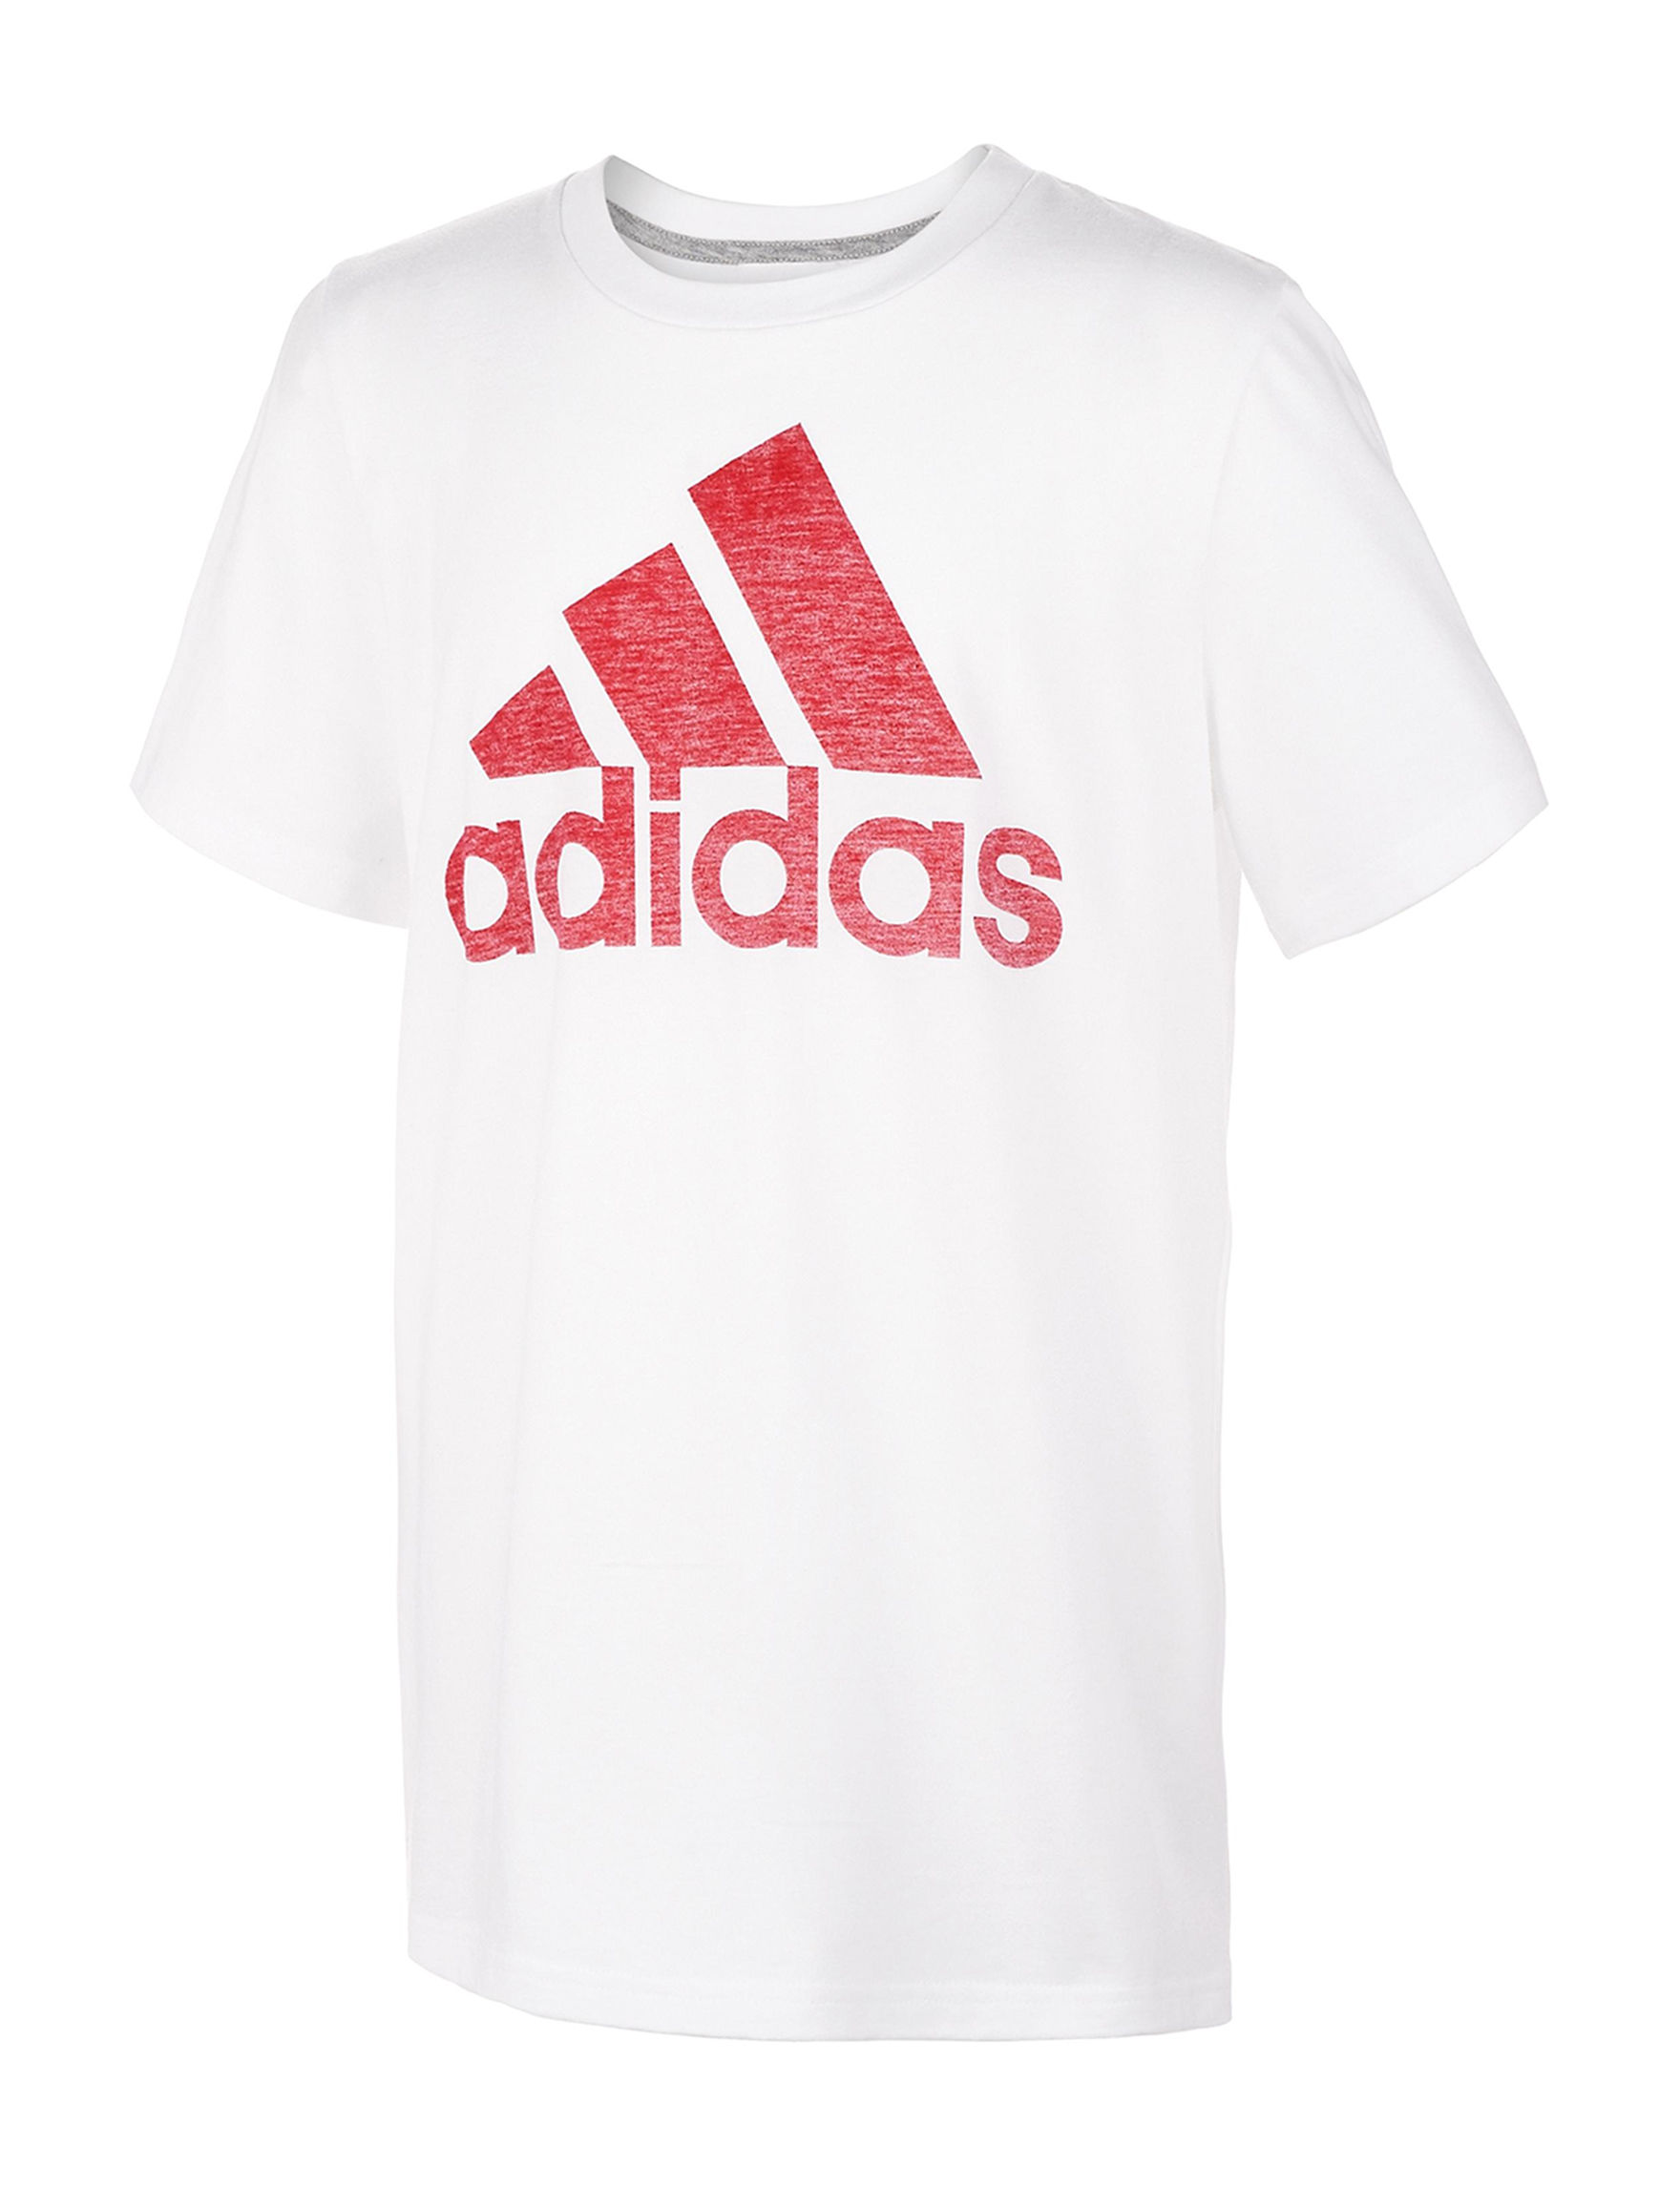 Adidas White / Red Tees & Tanks